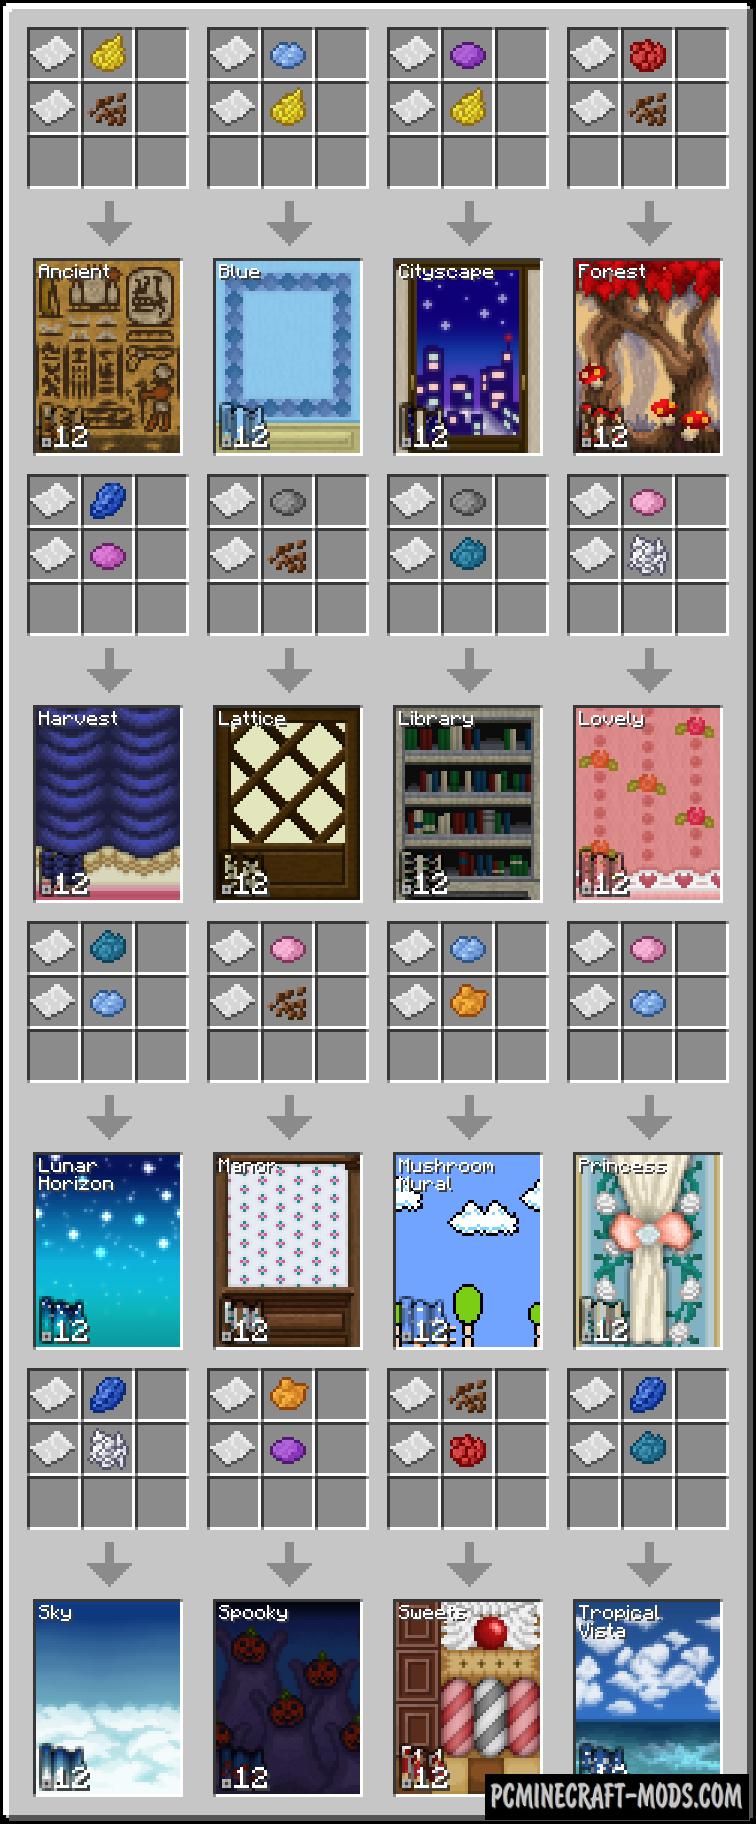 Wallpaper - Decor Mod For Minecraft 1.8.9, 1.7.10